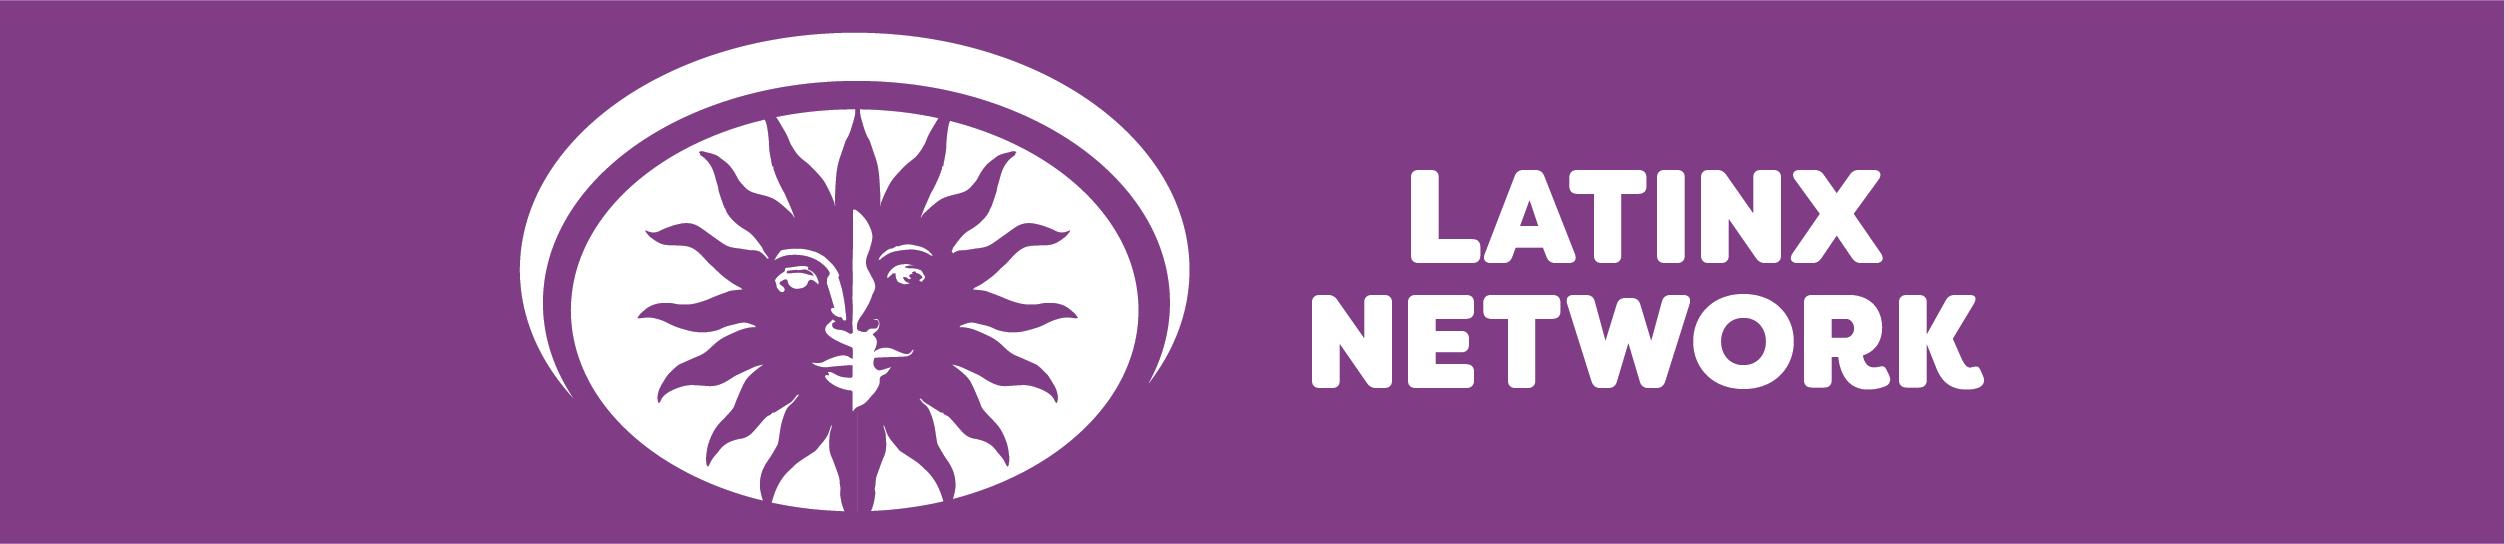 latinx network and logo